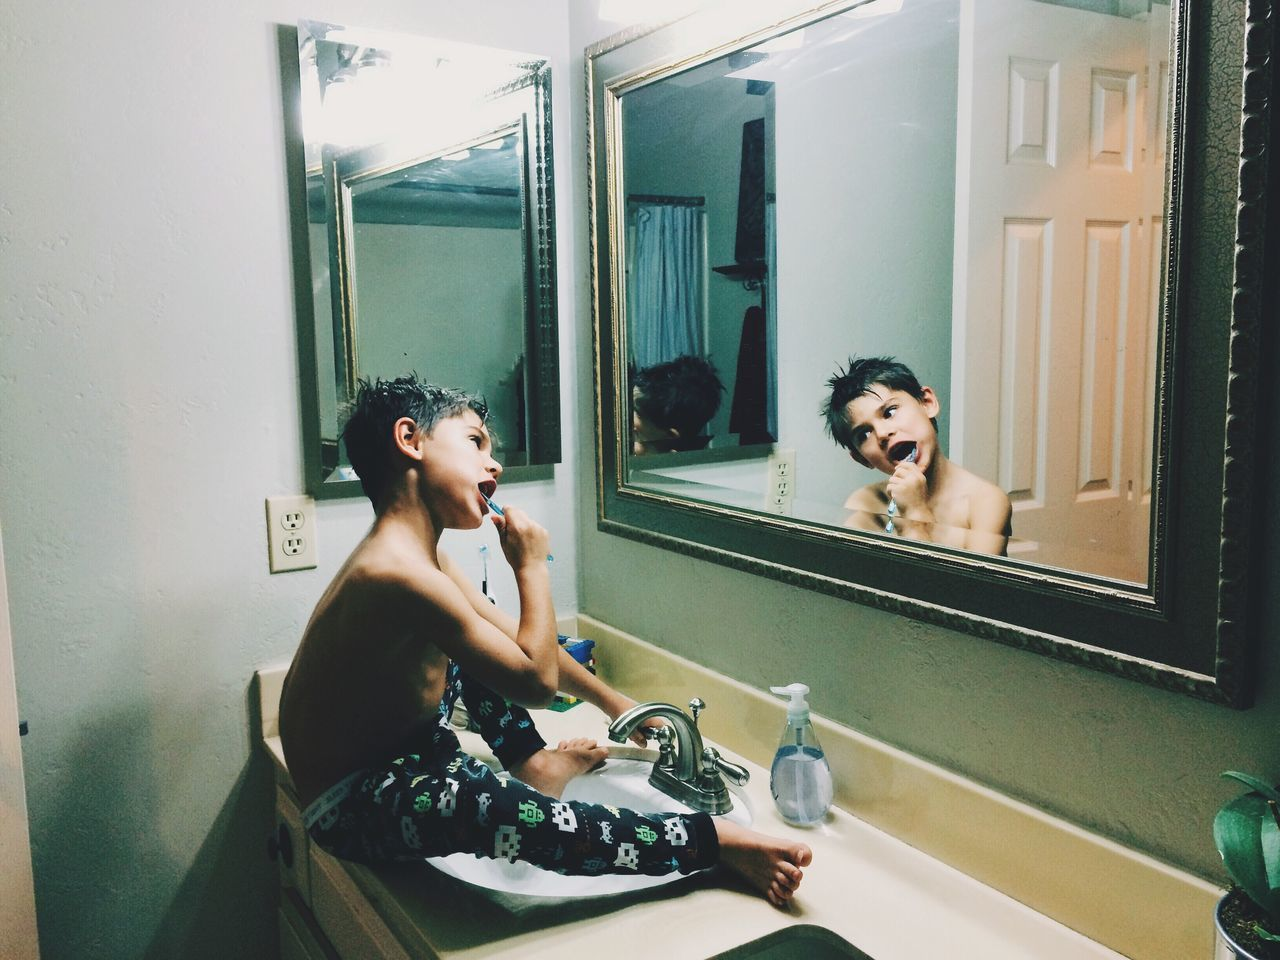 Brush your teeth Bedtime Brushing My Teeth The Portraitist - 2016 EyeEm Awards My Year My View